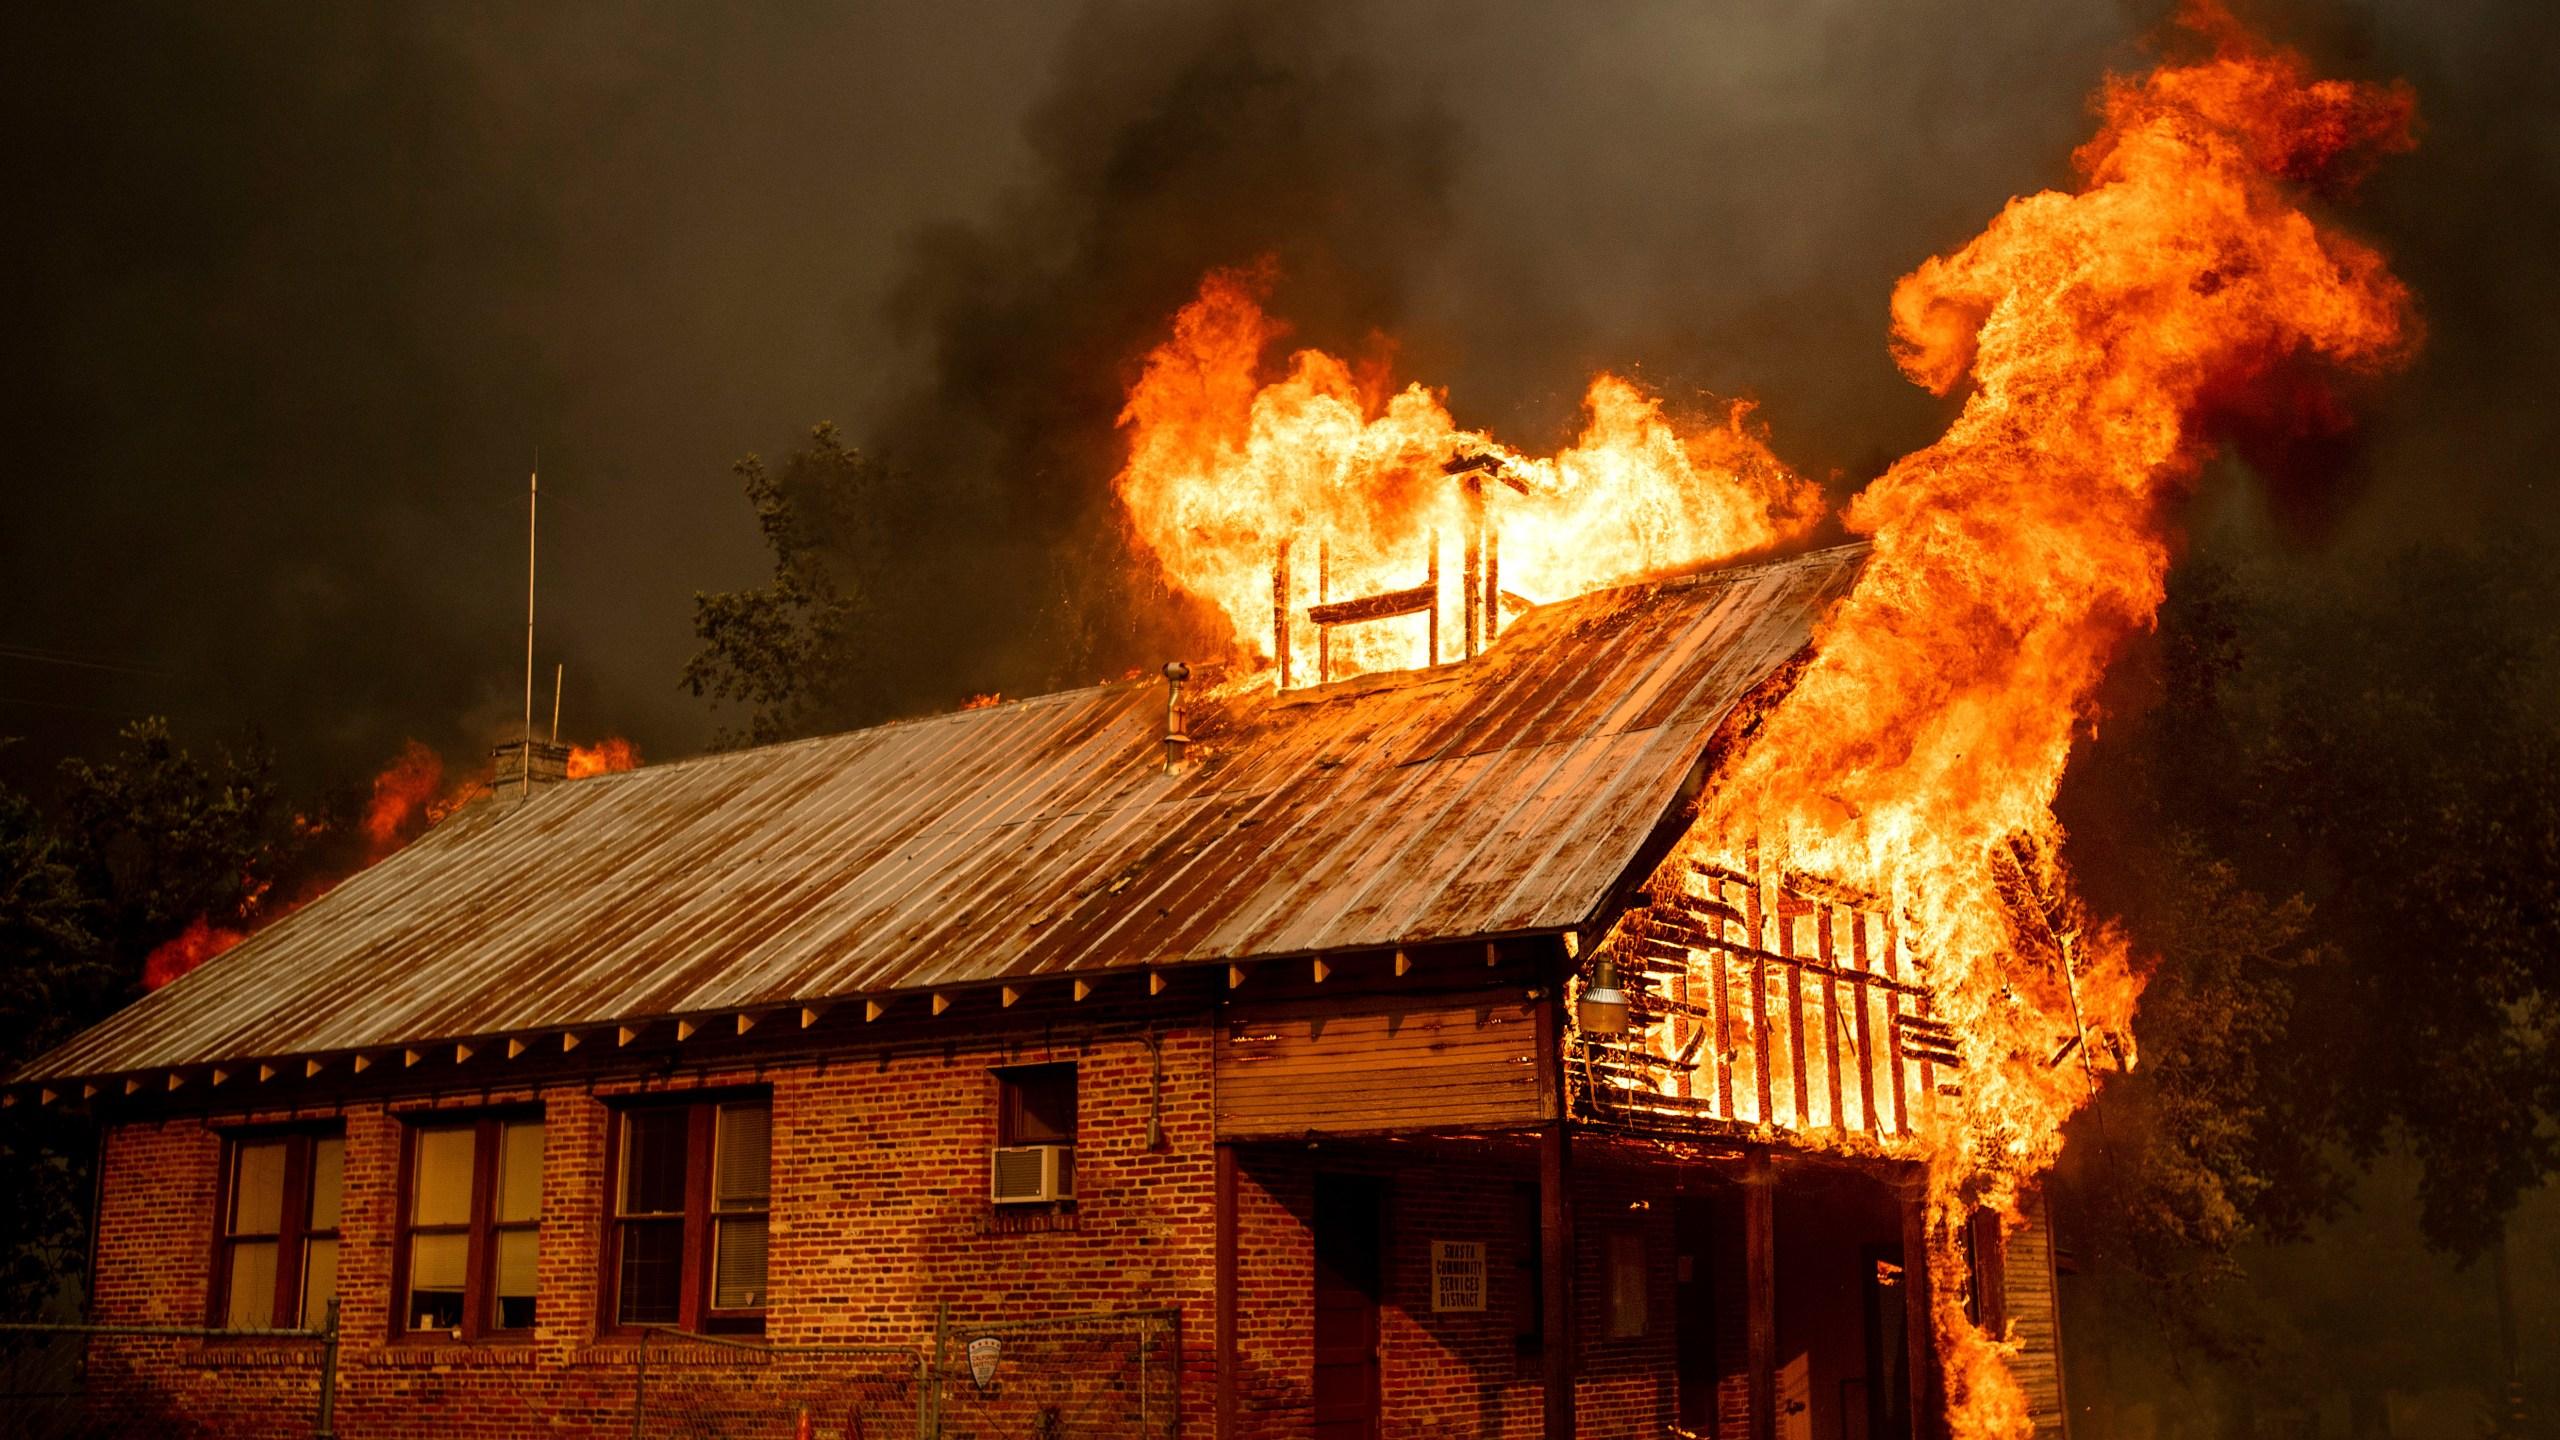 APTOPIX_California_Wildfires_82511-159532.jpg02819688